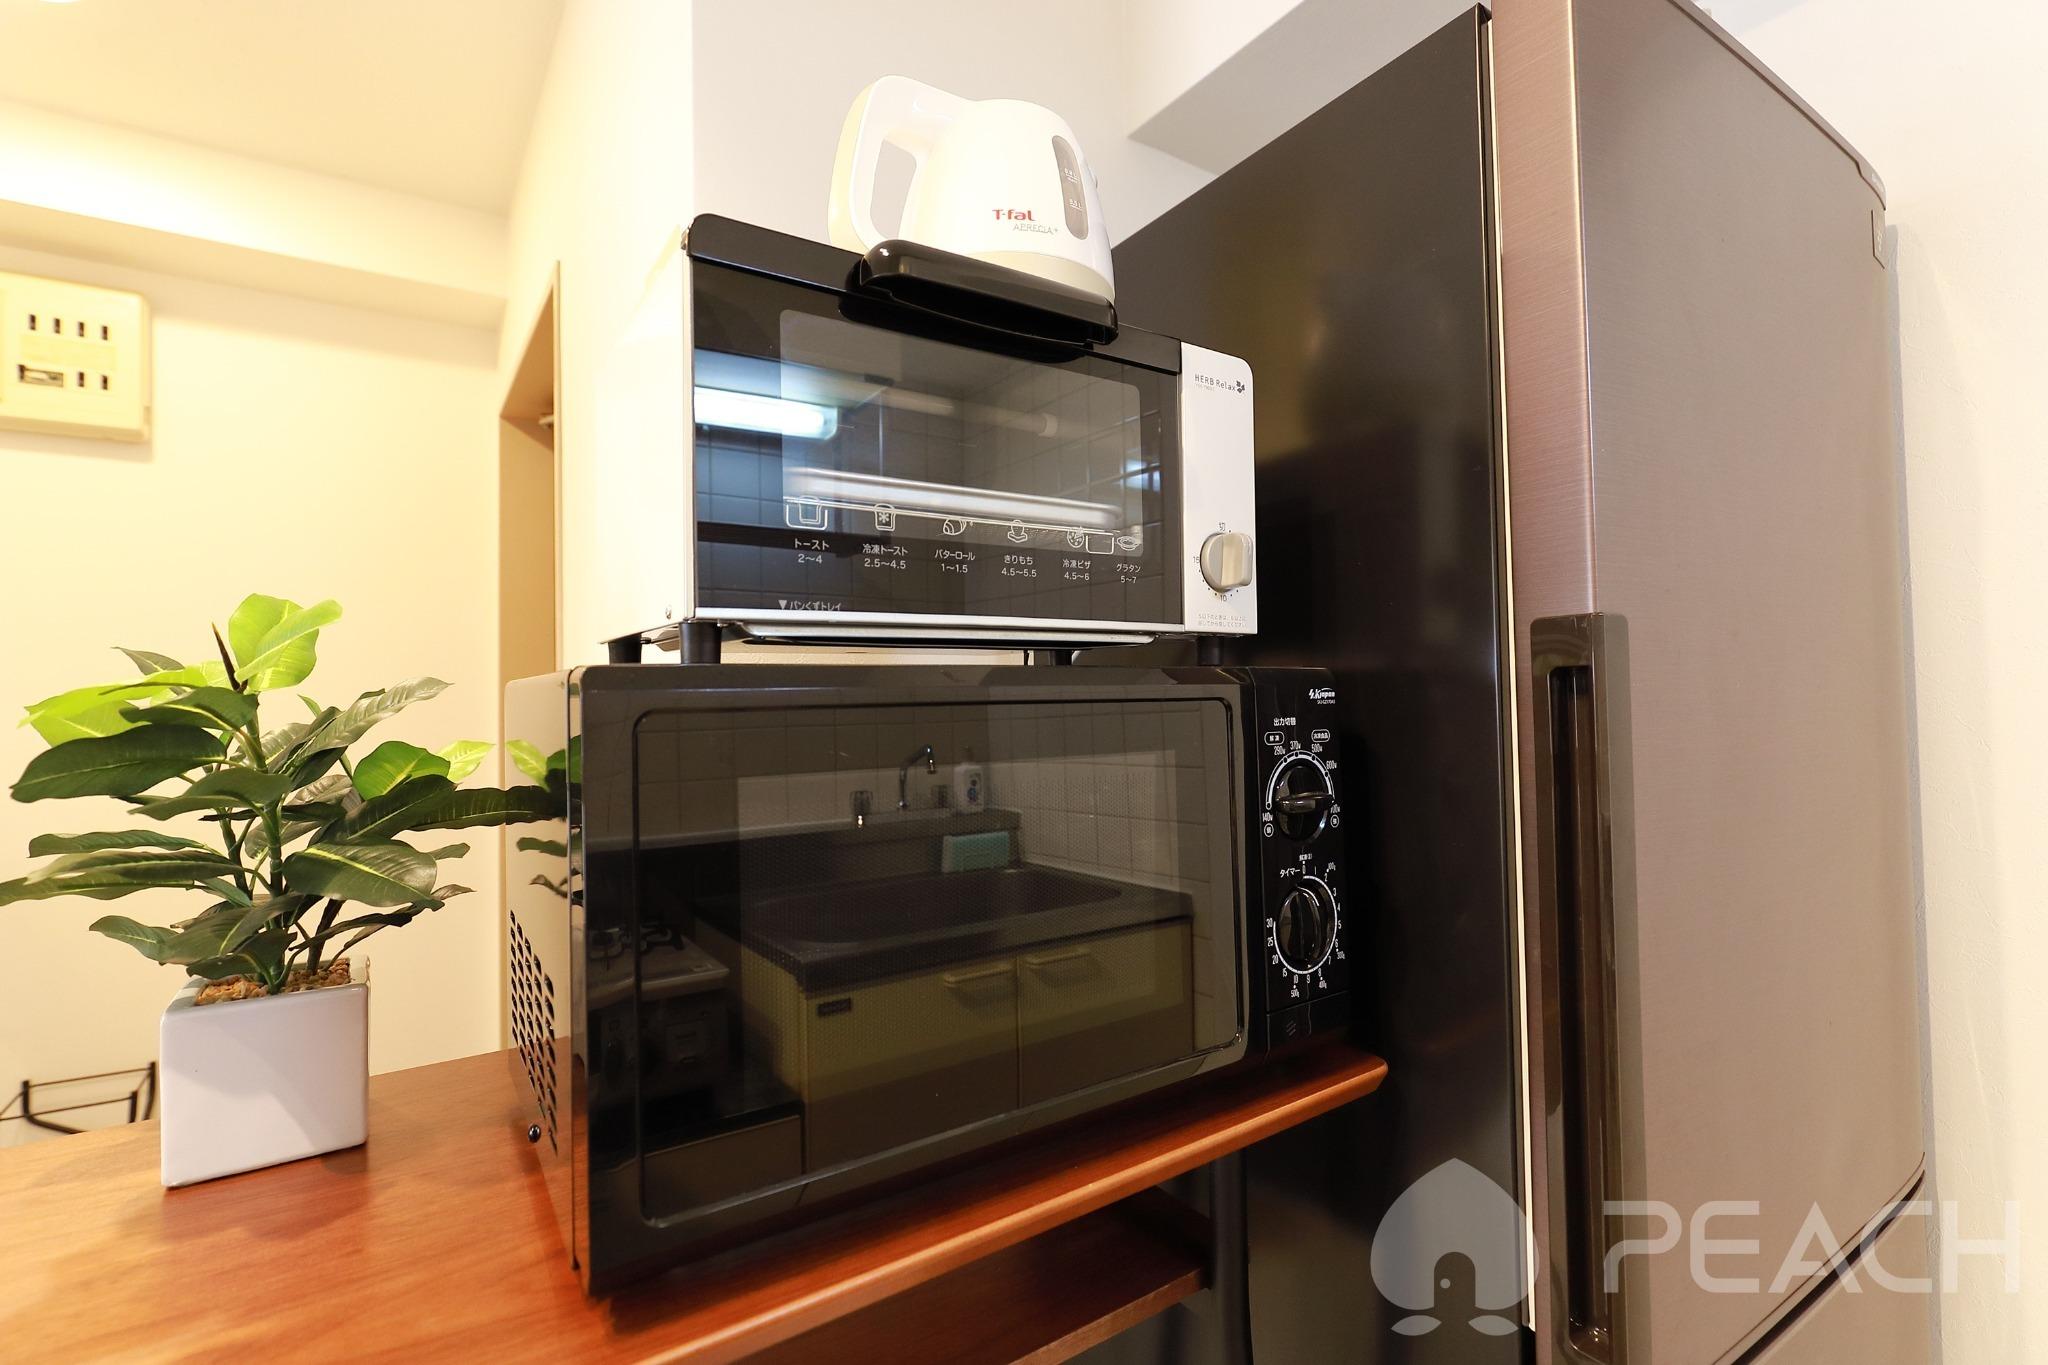 microwave,Toaster,Kettle